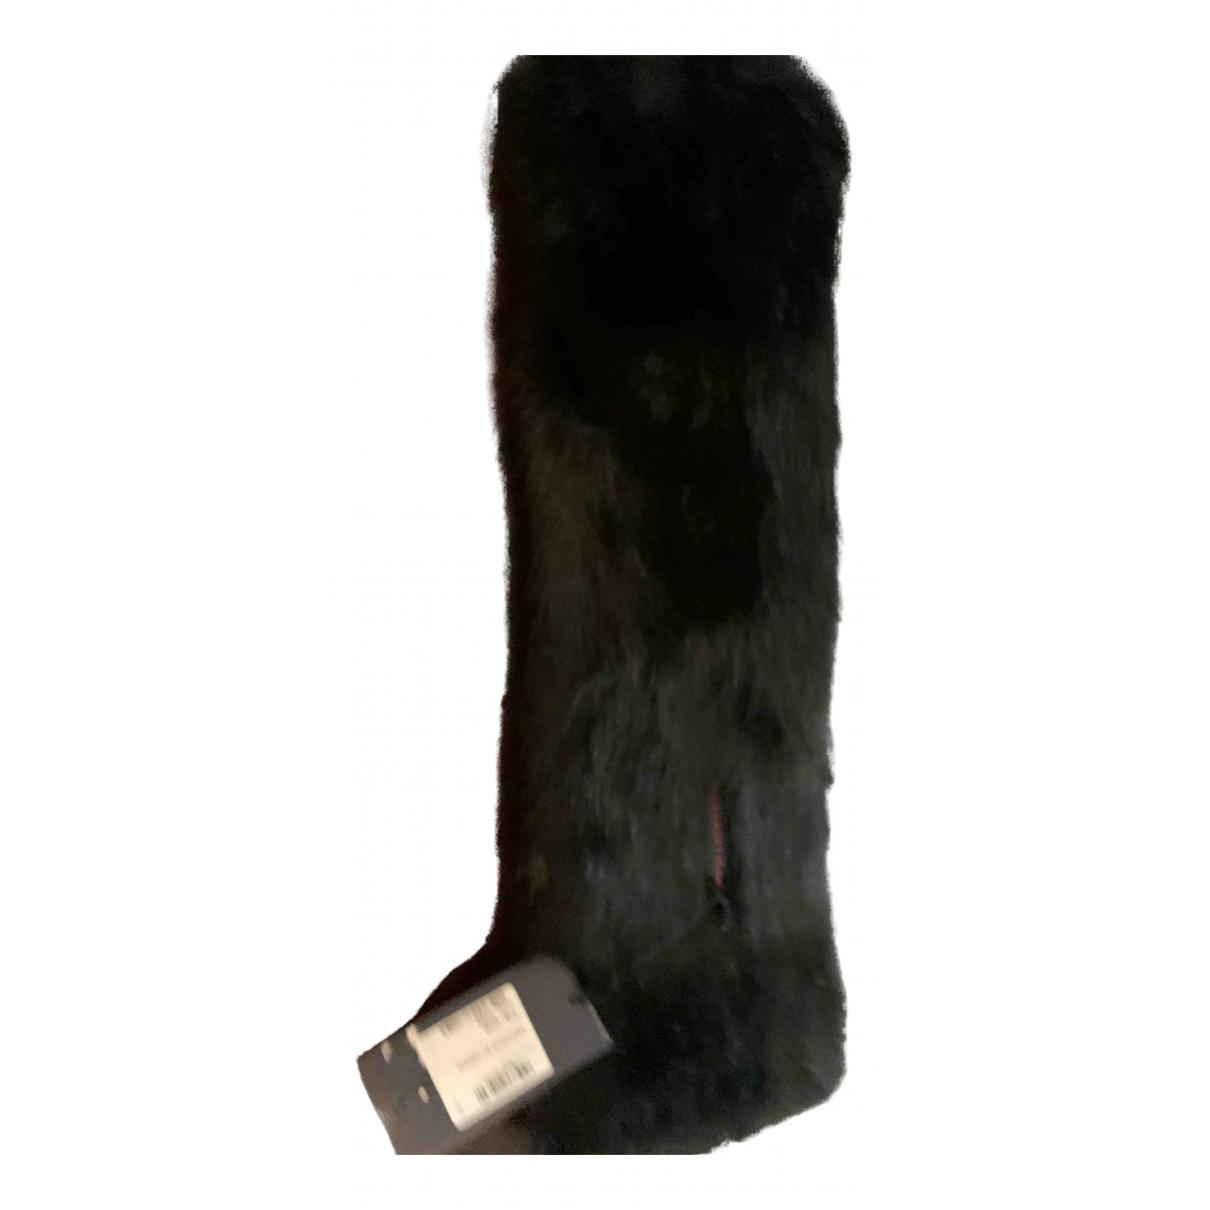 Trussardi Jean - Foulard   pour femme en fourrure - noir